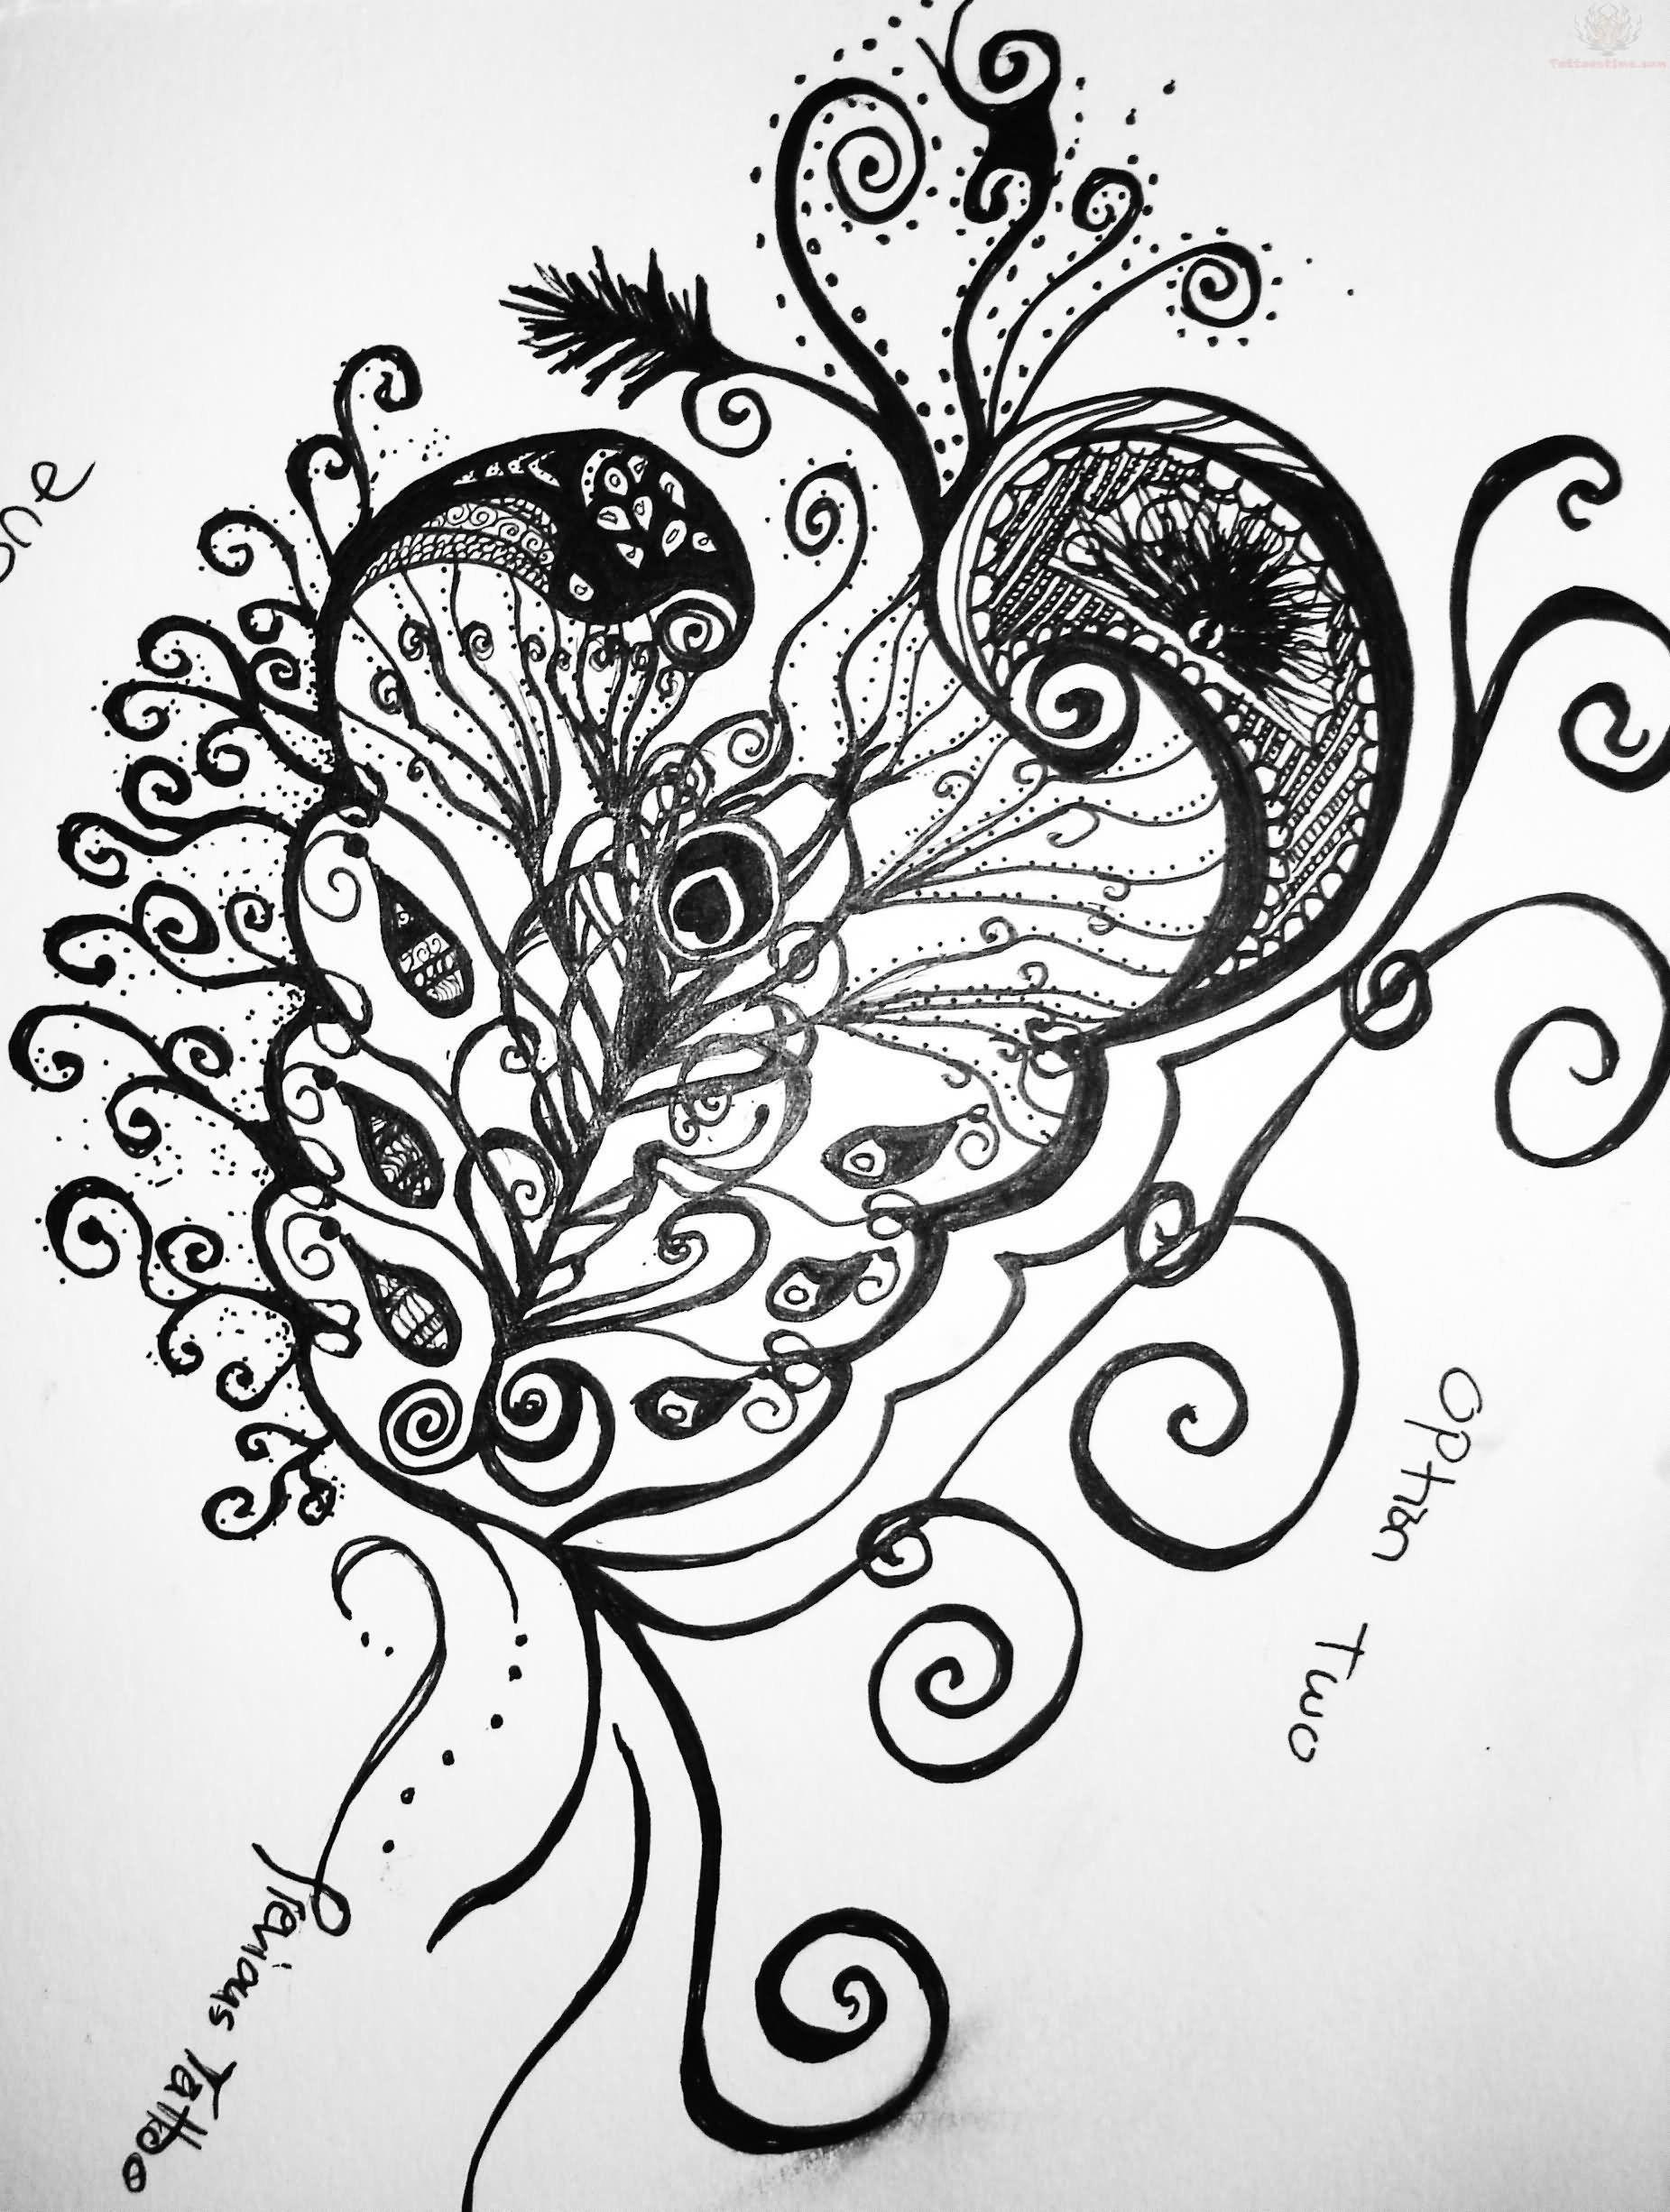 paisley pattern tattoo design tattoos pinterest paisley rh pinterest co uk Paisley Sleeve Tattoo Men Paisley Tattoo Designs Women